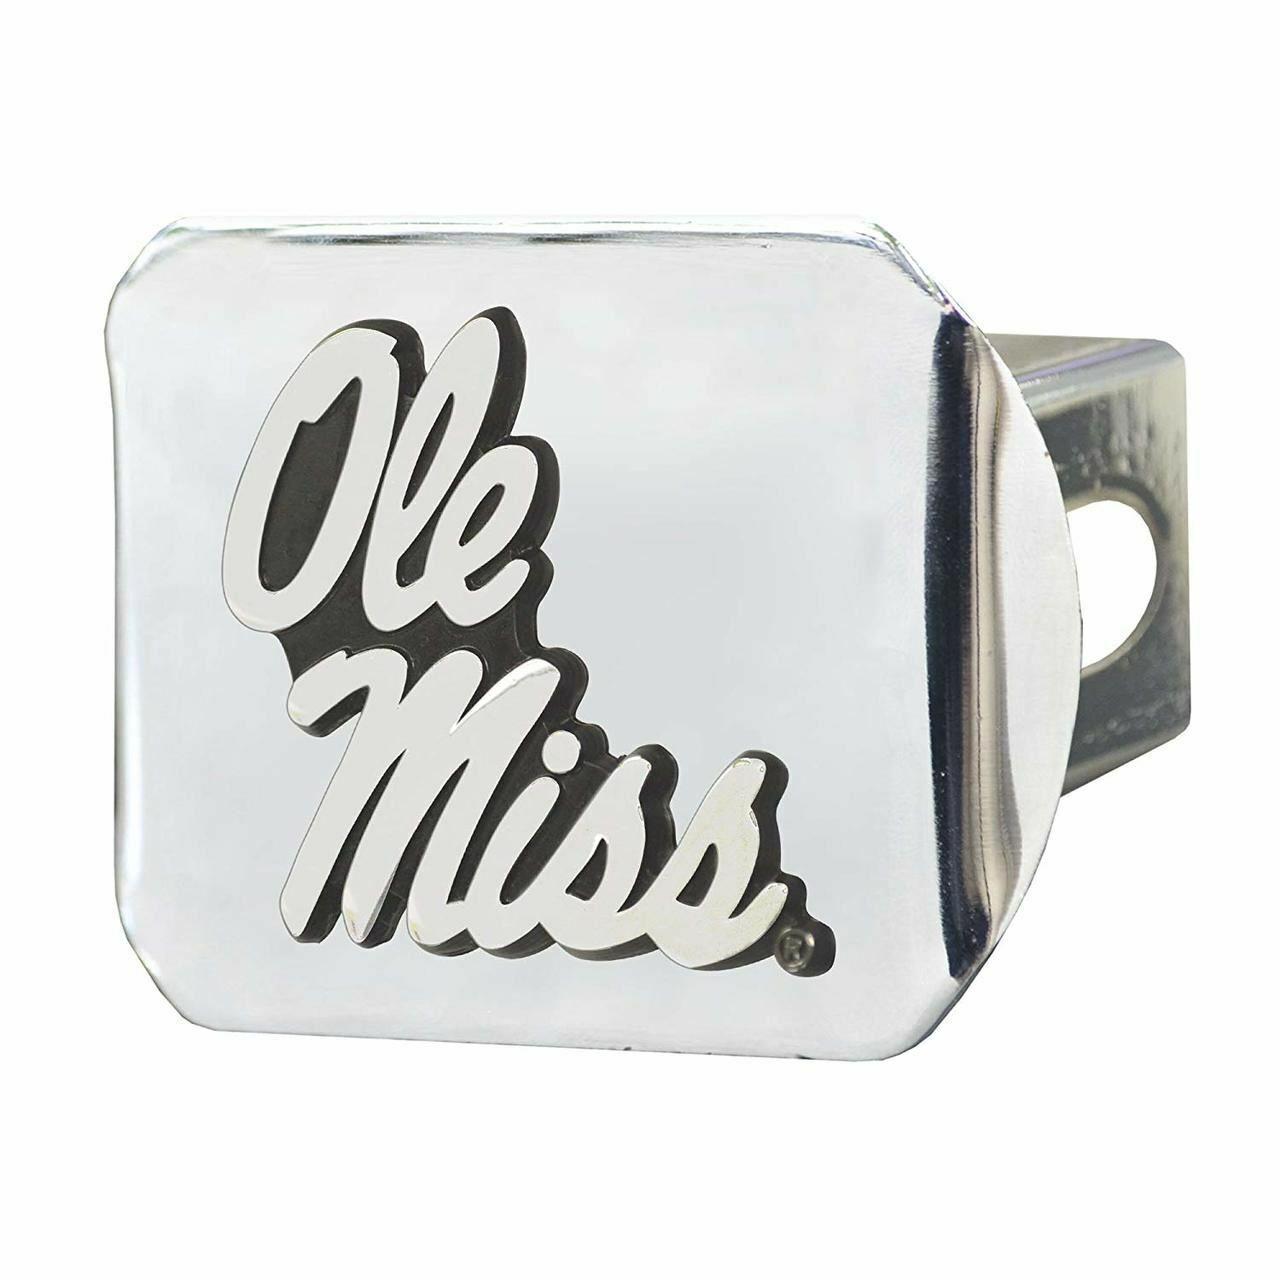 University of Mississippi Ole Miss METAL emblem red trim on black METAL Hitch Cover AMG